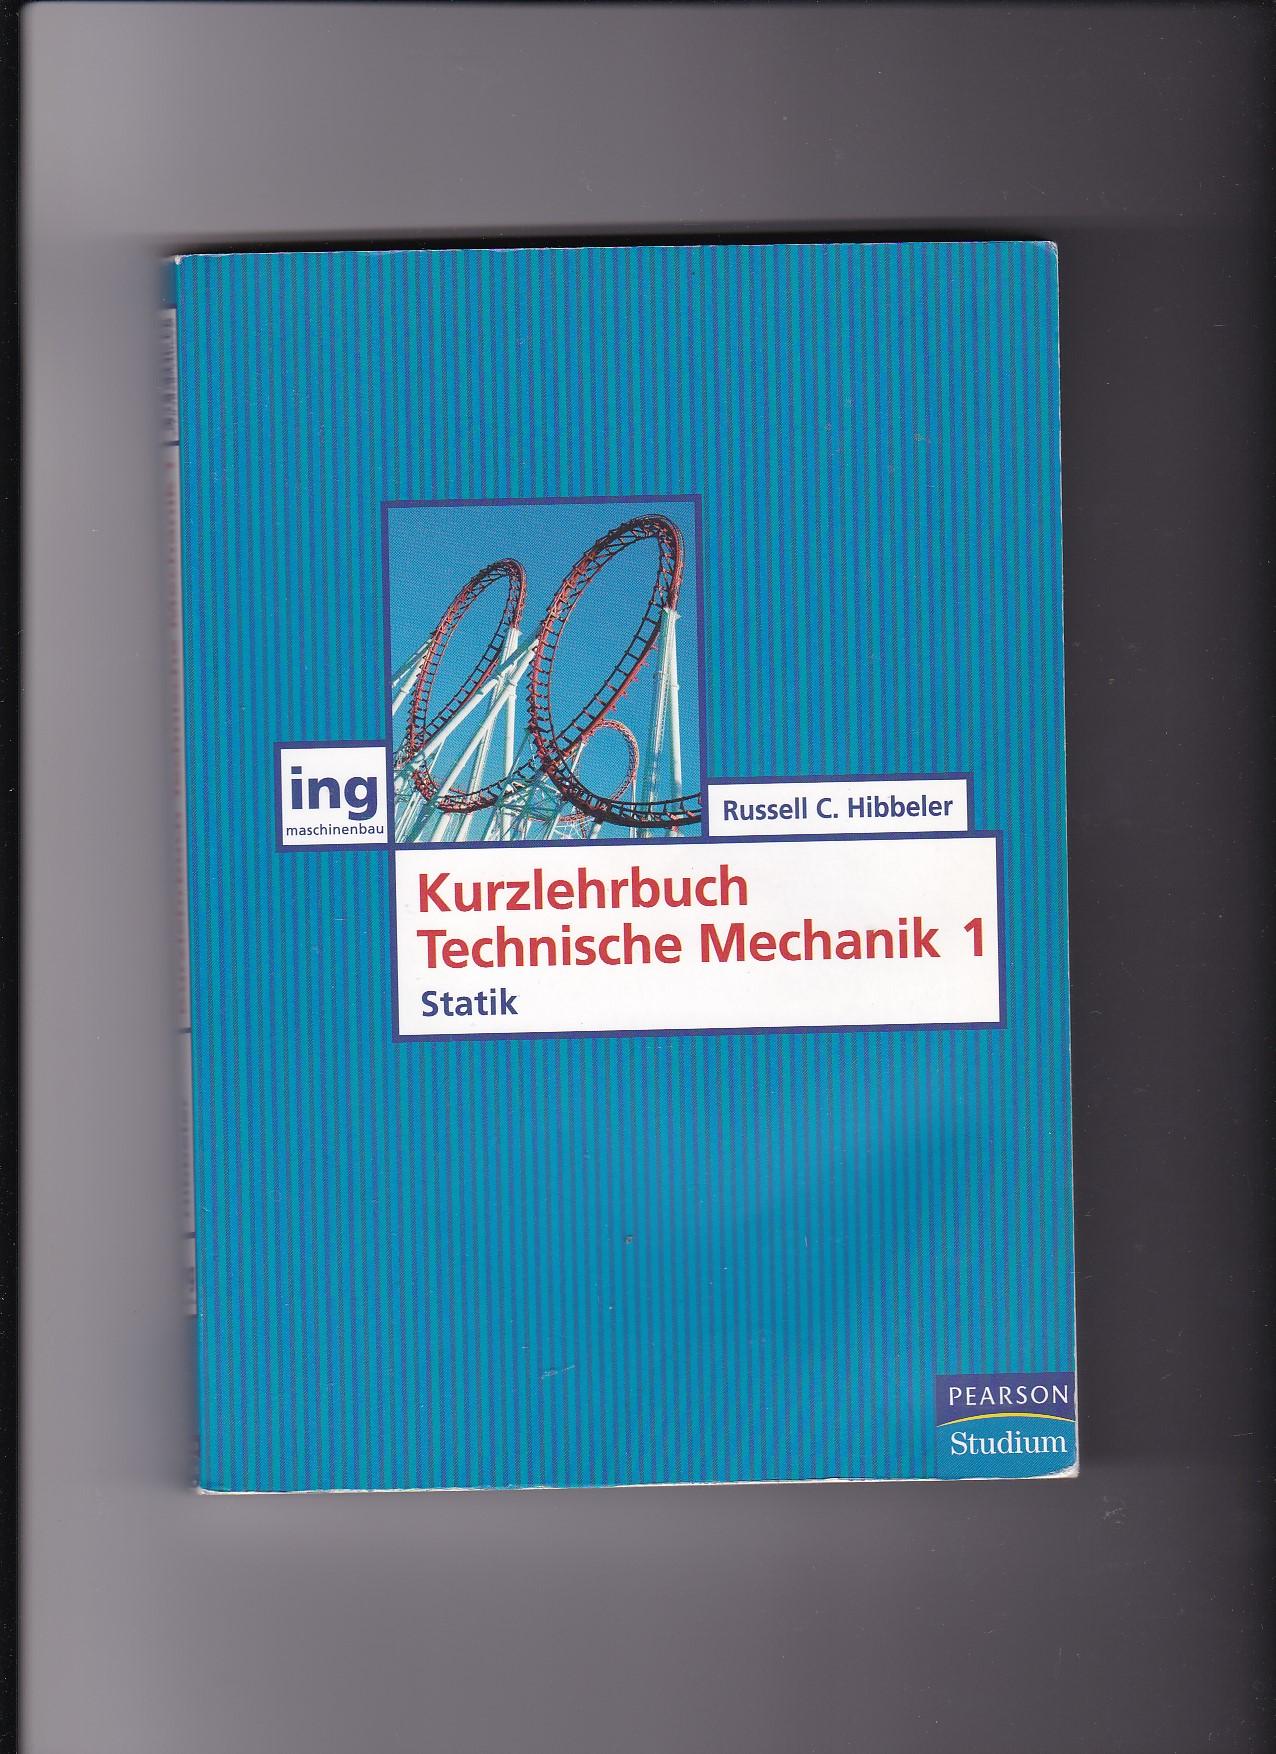 Russell C. Hibbeler, Kurzlehrbuch technische Mechanik Teil 1 -  Statik  1. Auflage - Hibbeler, Russell C.